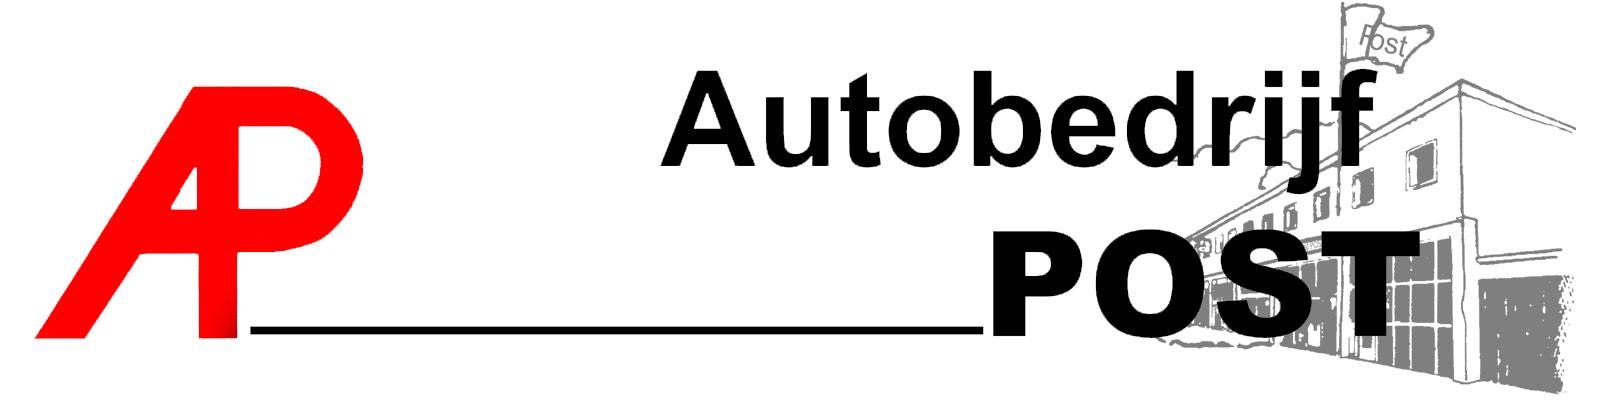 Autobedrijf POST |